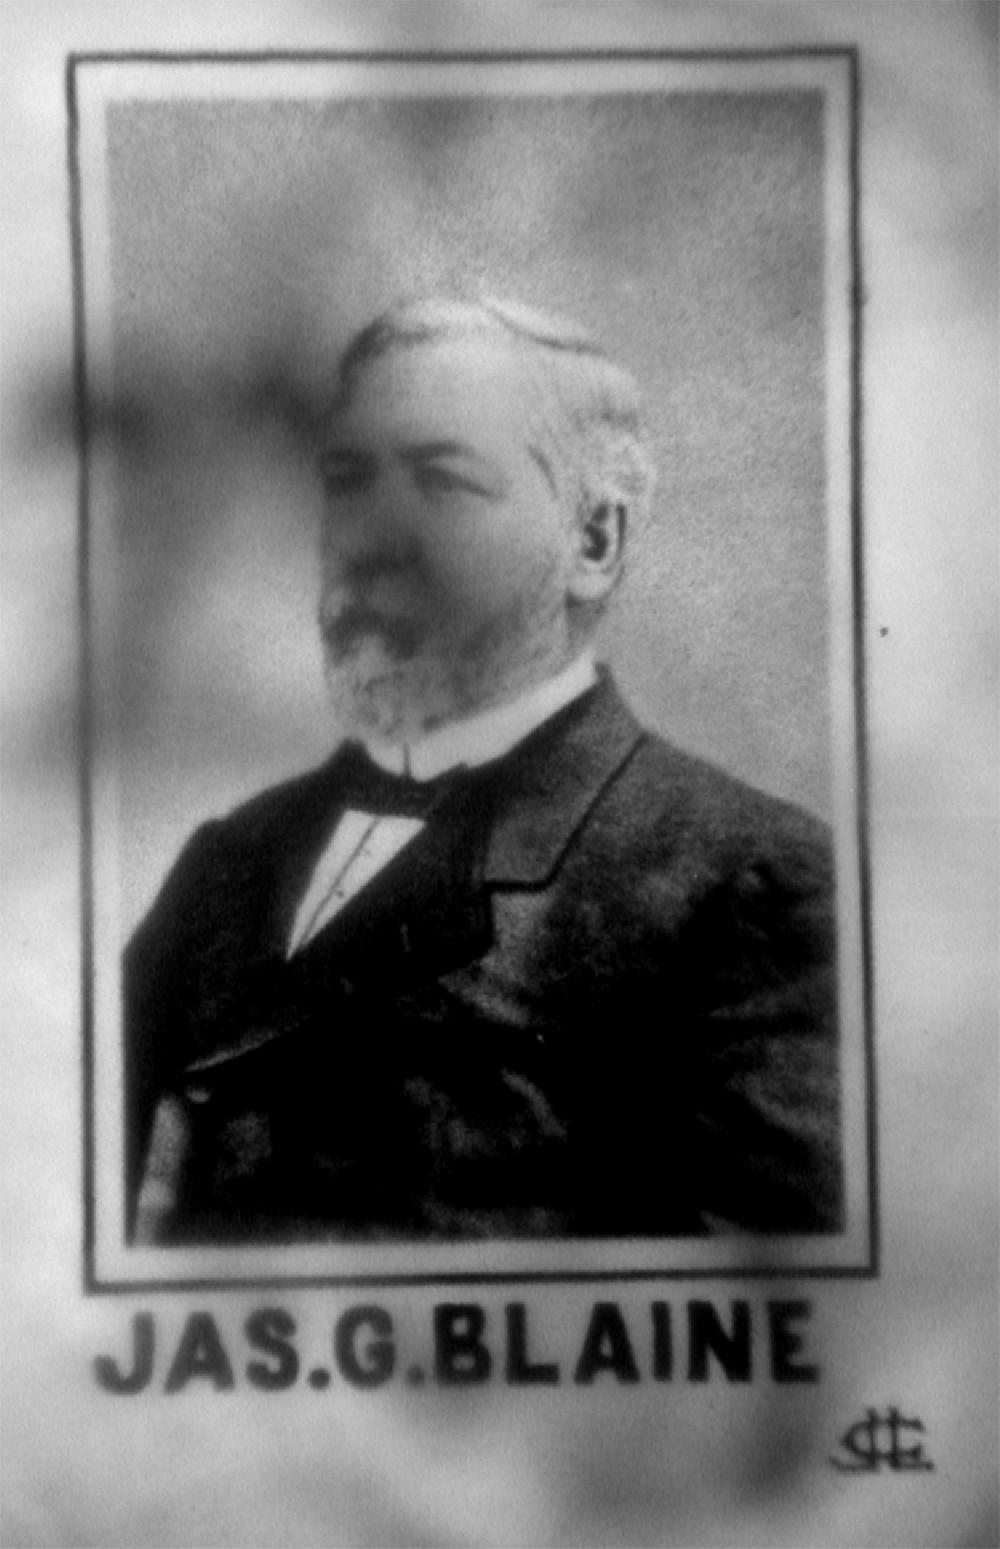 1884 CAMPAIGN PIECE FOR BLAINE